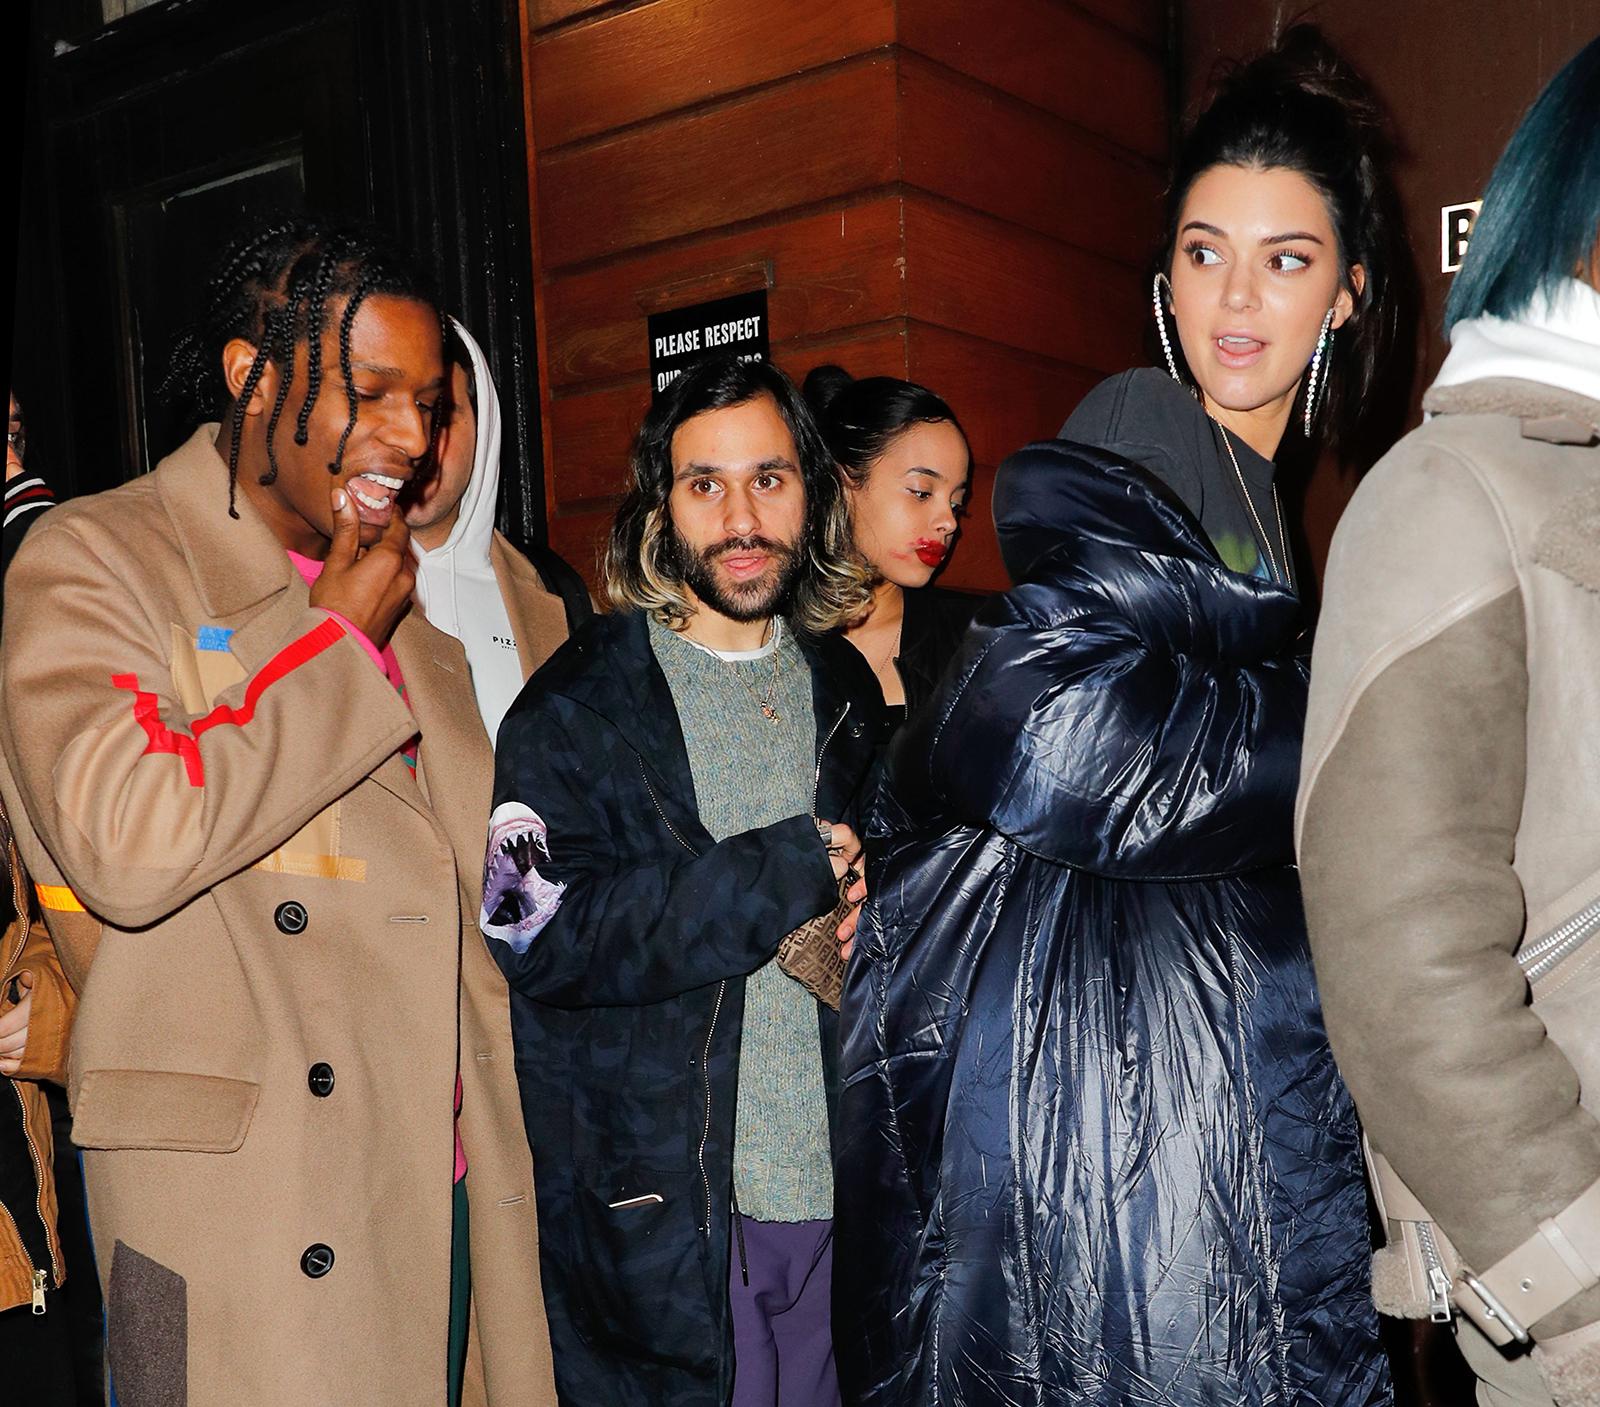 Kendall Jenner & A$AP Rocky